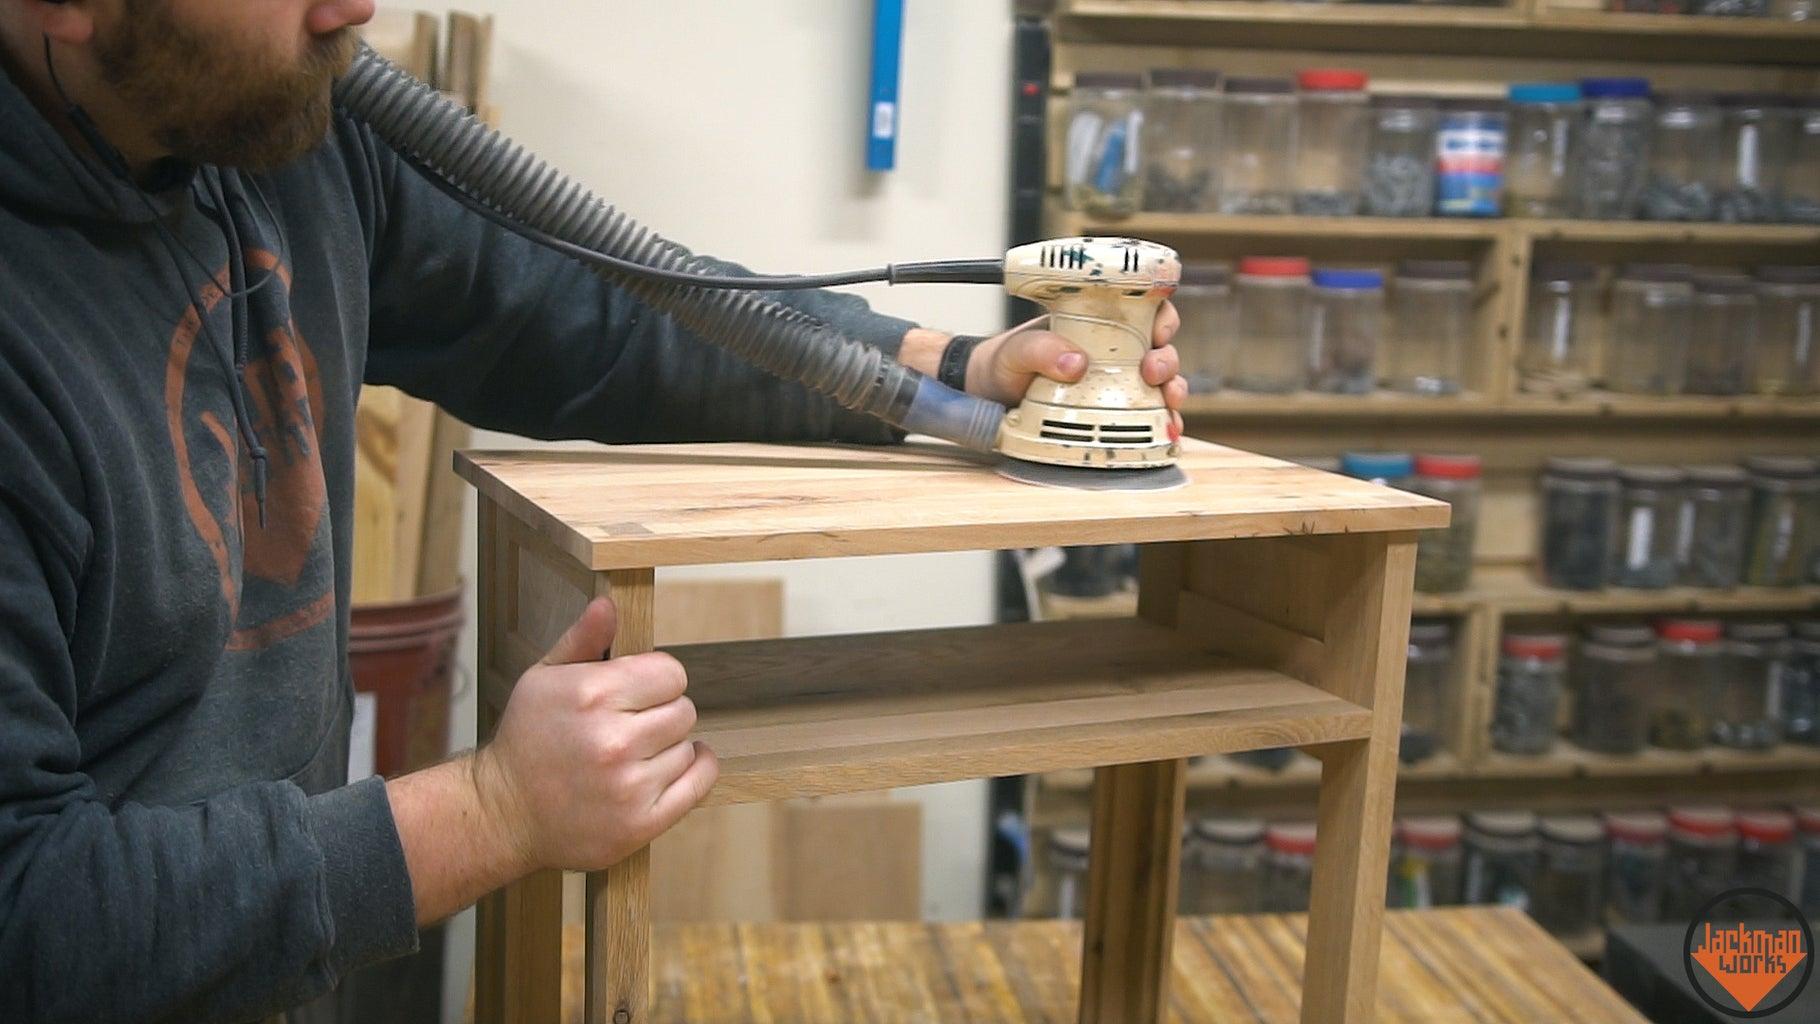 Cutting Overhang Flush and Final Sanding